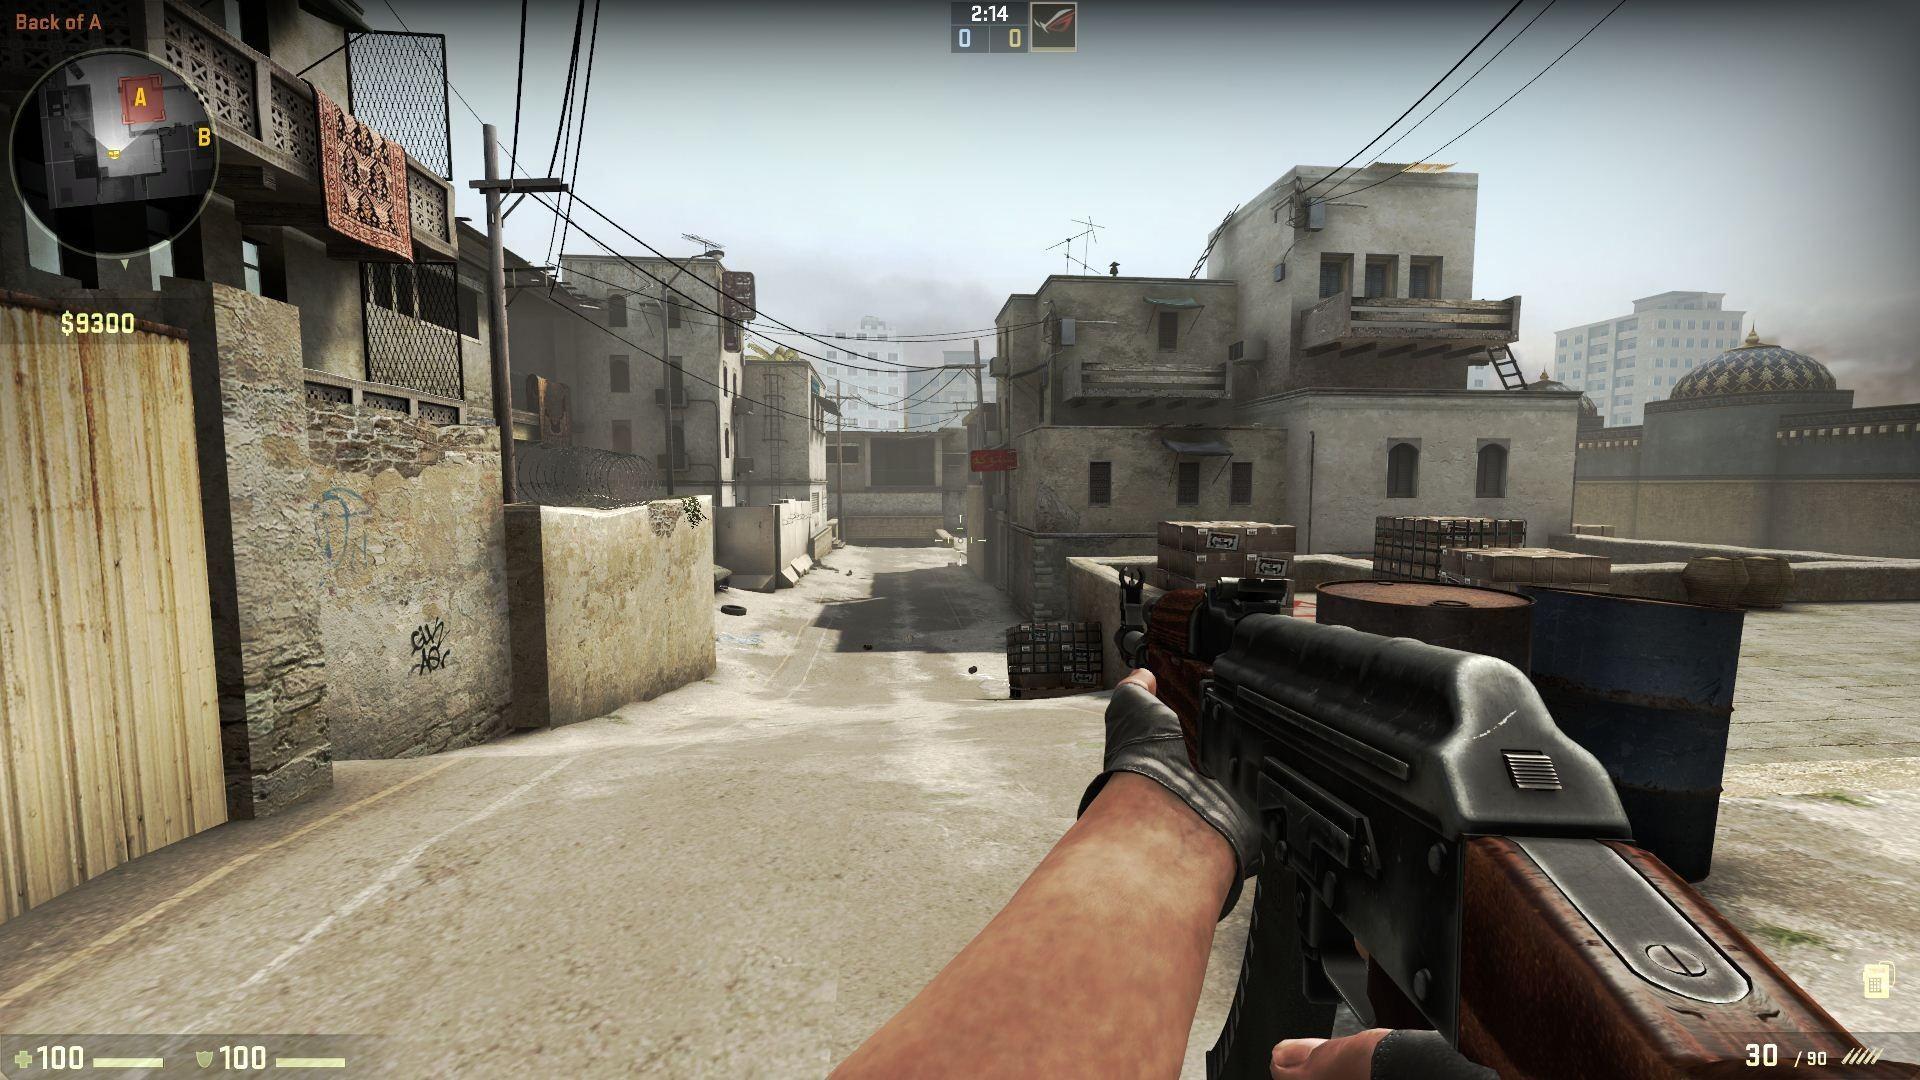 BUY Counter-Strike: Global Offensive (CS: GO) Steam CD KEY